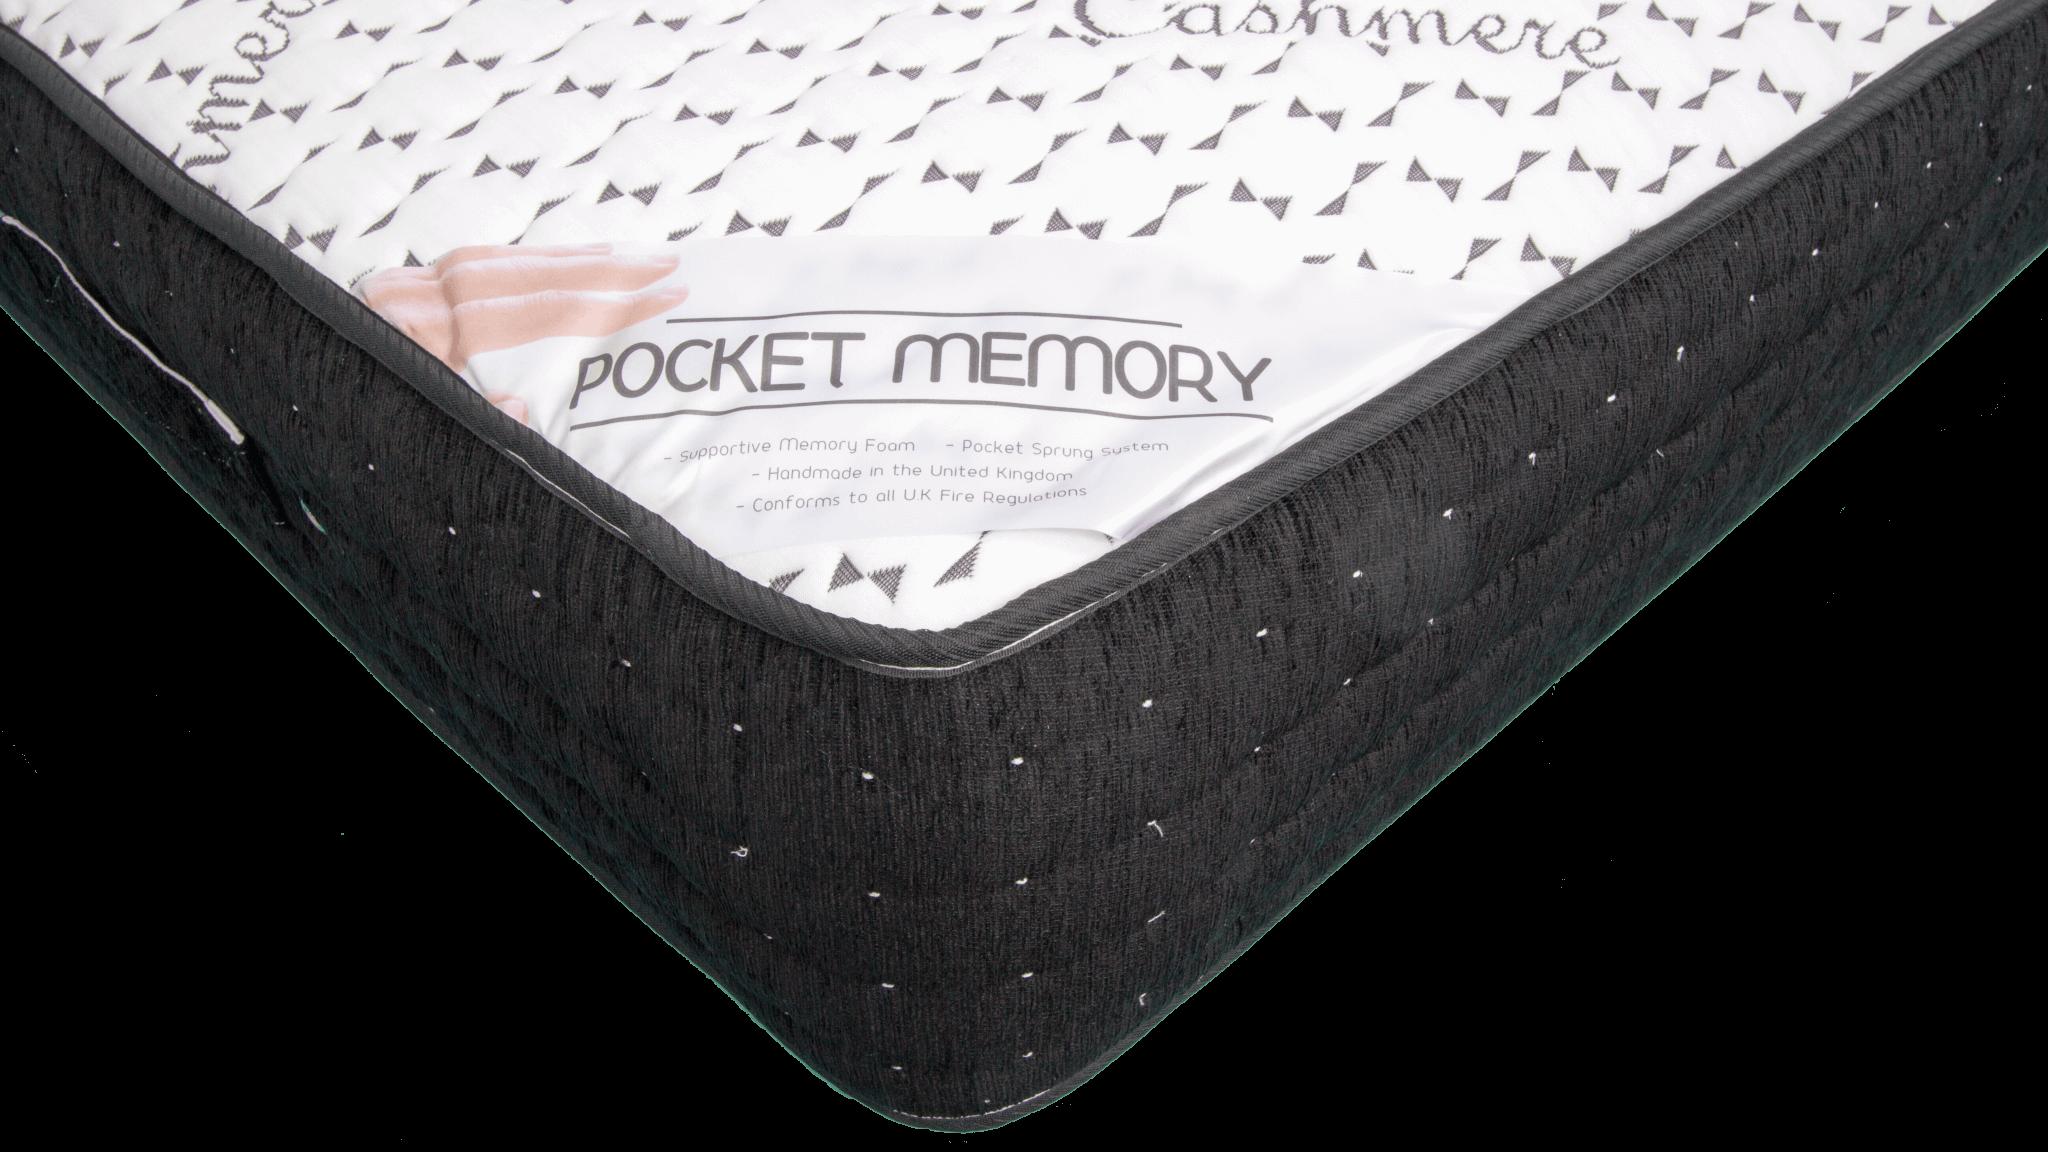 best loved dea6e 8b7f1 Orthopaedic Pocket Sprung Memory Foam Mattress